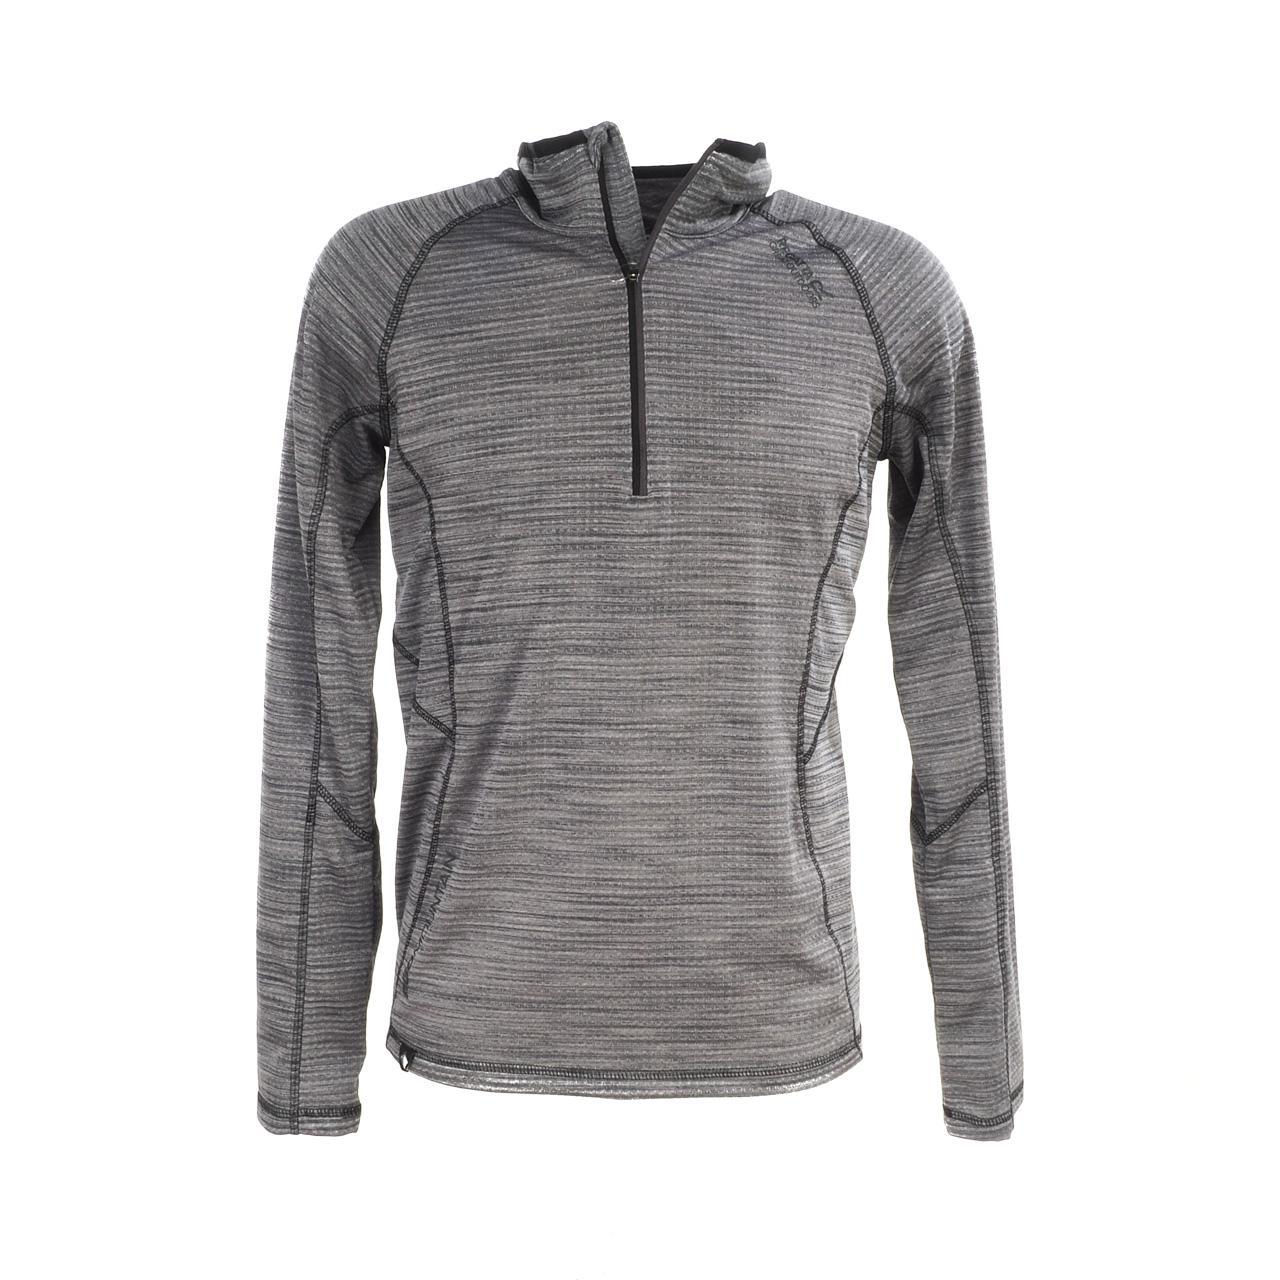 Under-Clothing-Thermal-Hot-Regatta-Yonder-sealgrey1-2z-Polar-Grey-16101-N